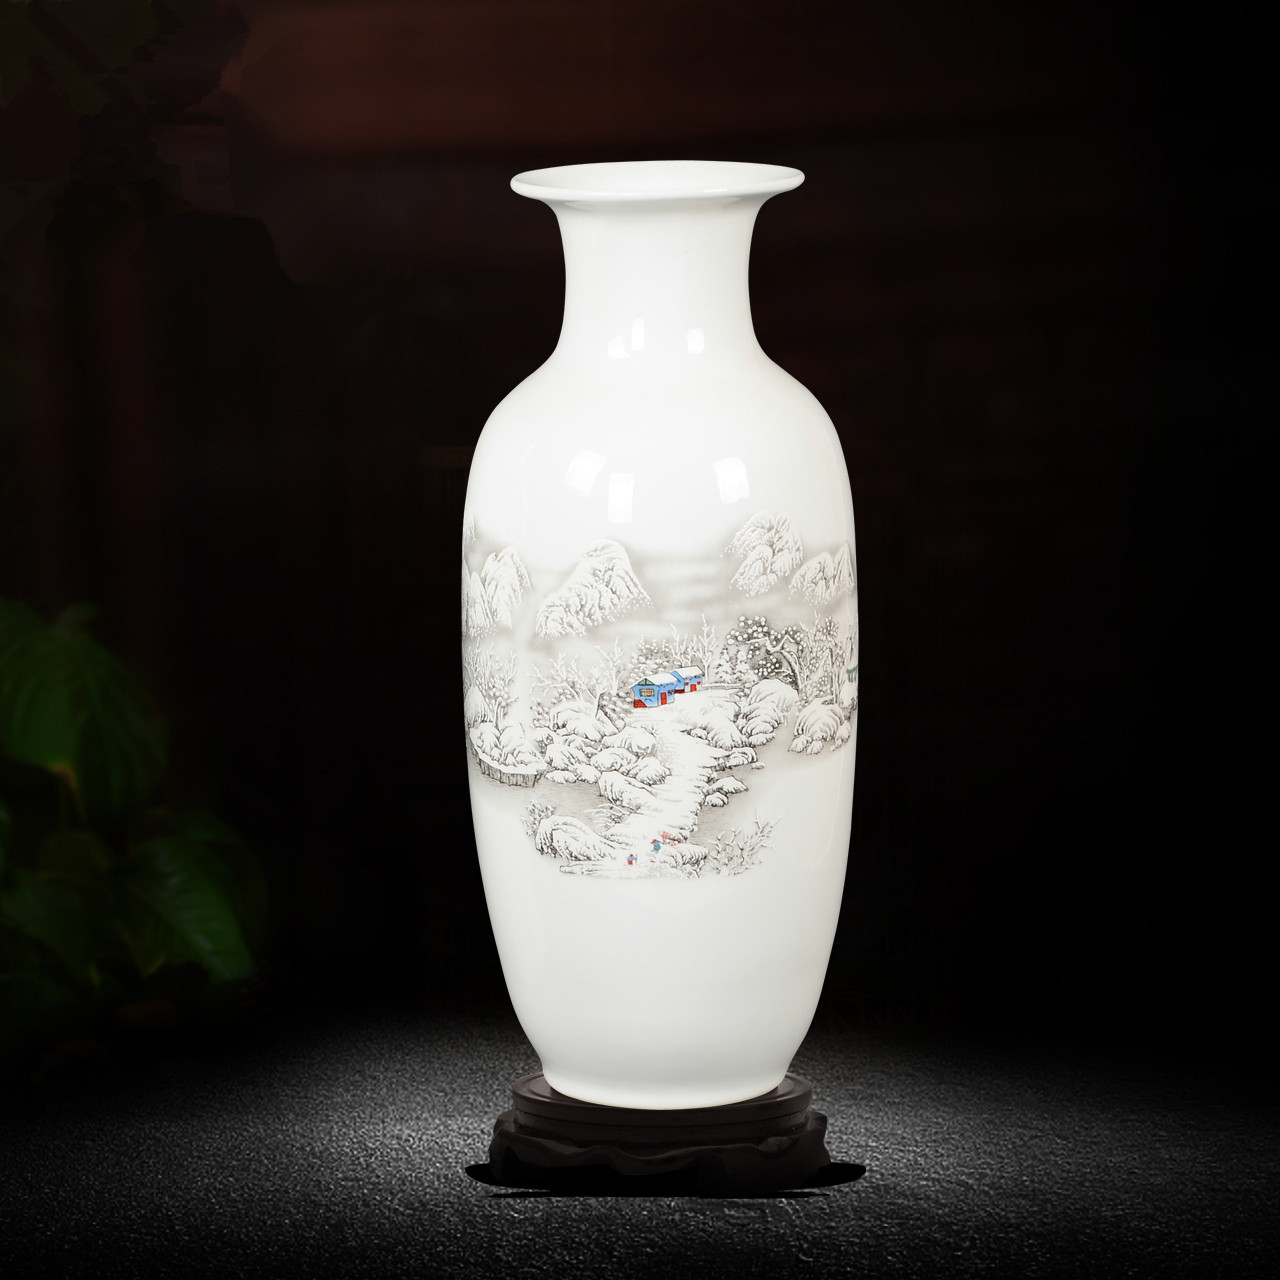 Chinese Jingdezhen Large Tabletop Decoration Flower Vase Ceramic Vase Home Decoration Traditional Chinese Art Porcelain Vase vase